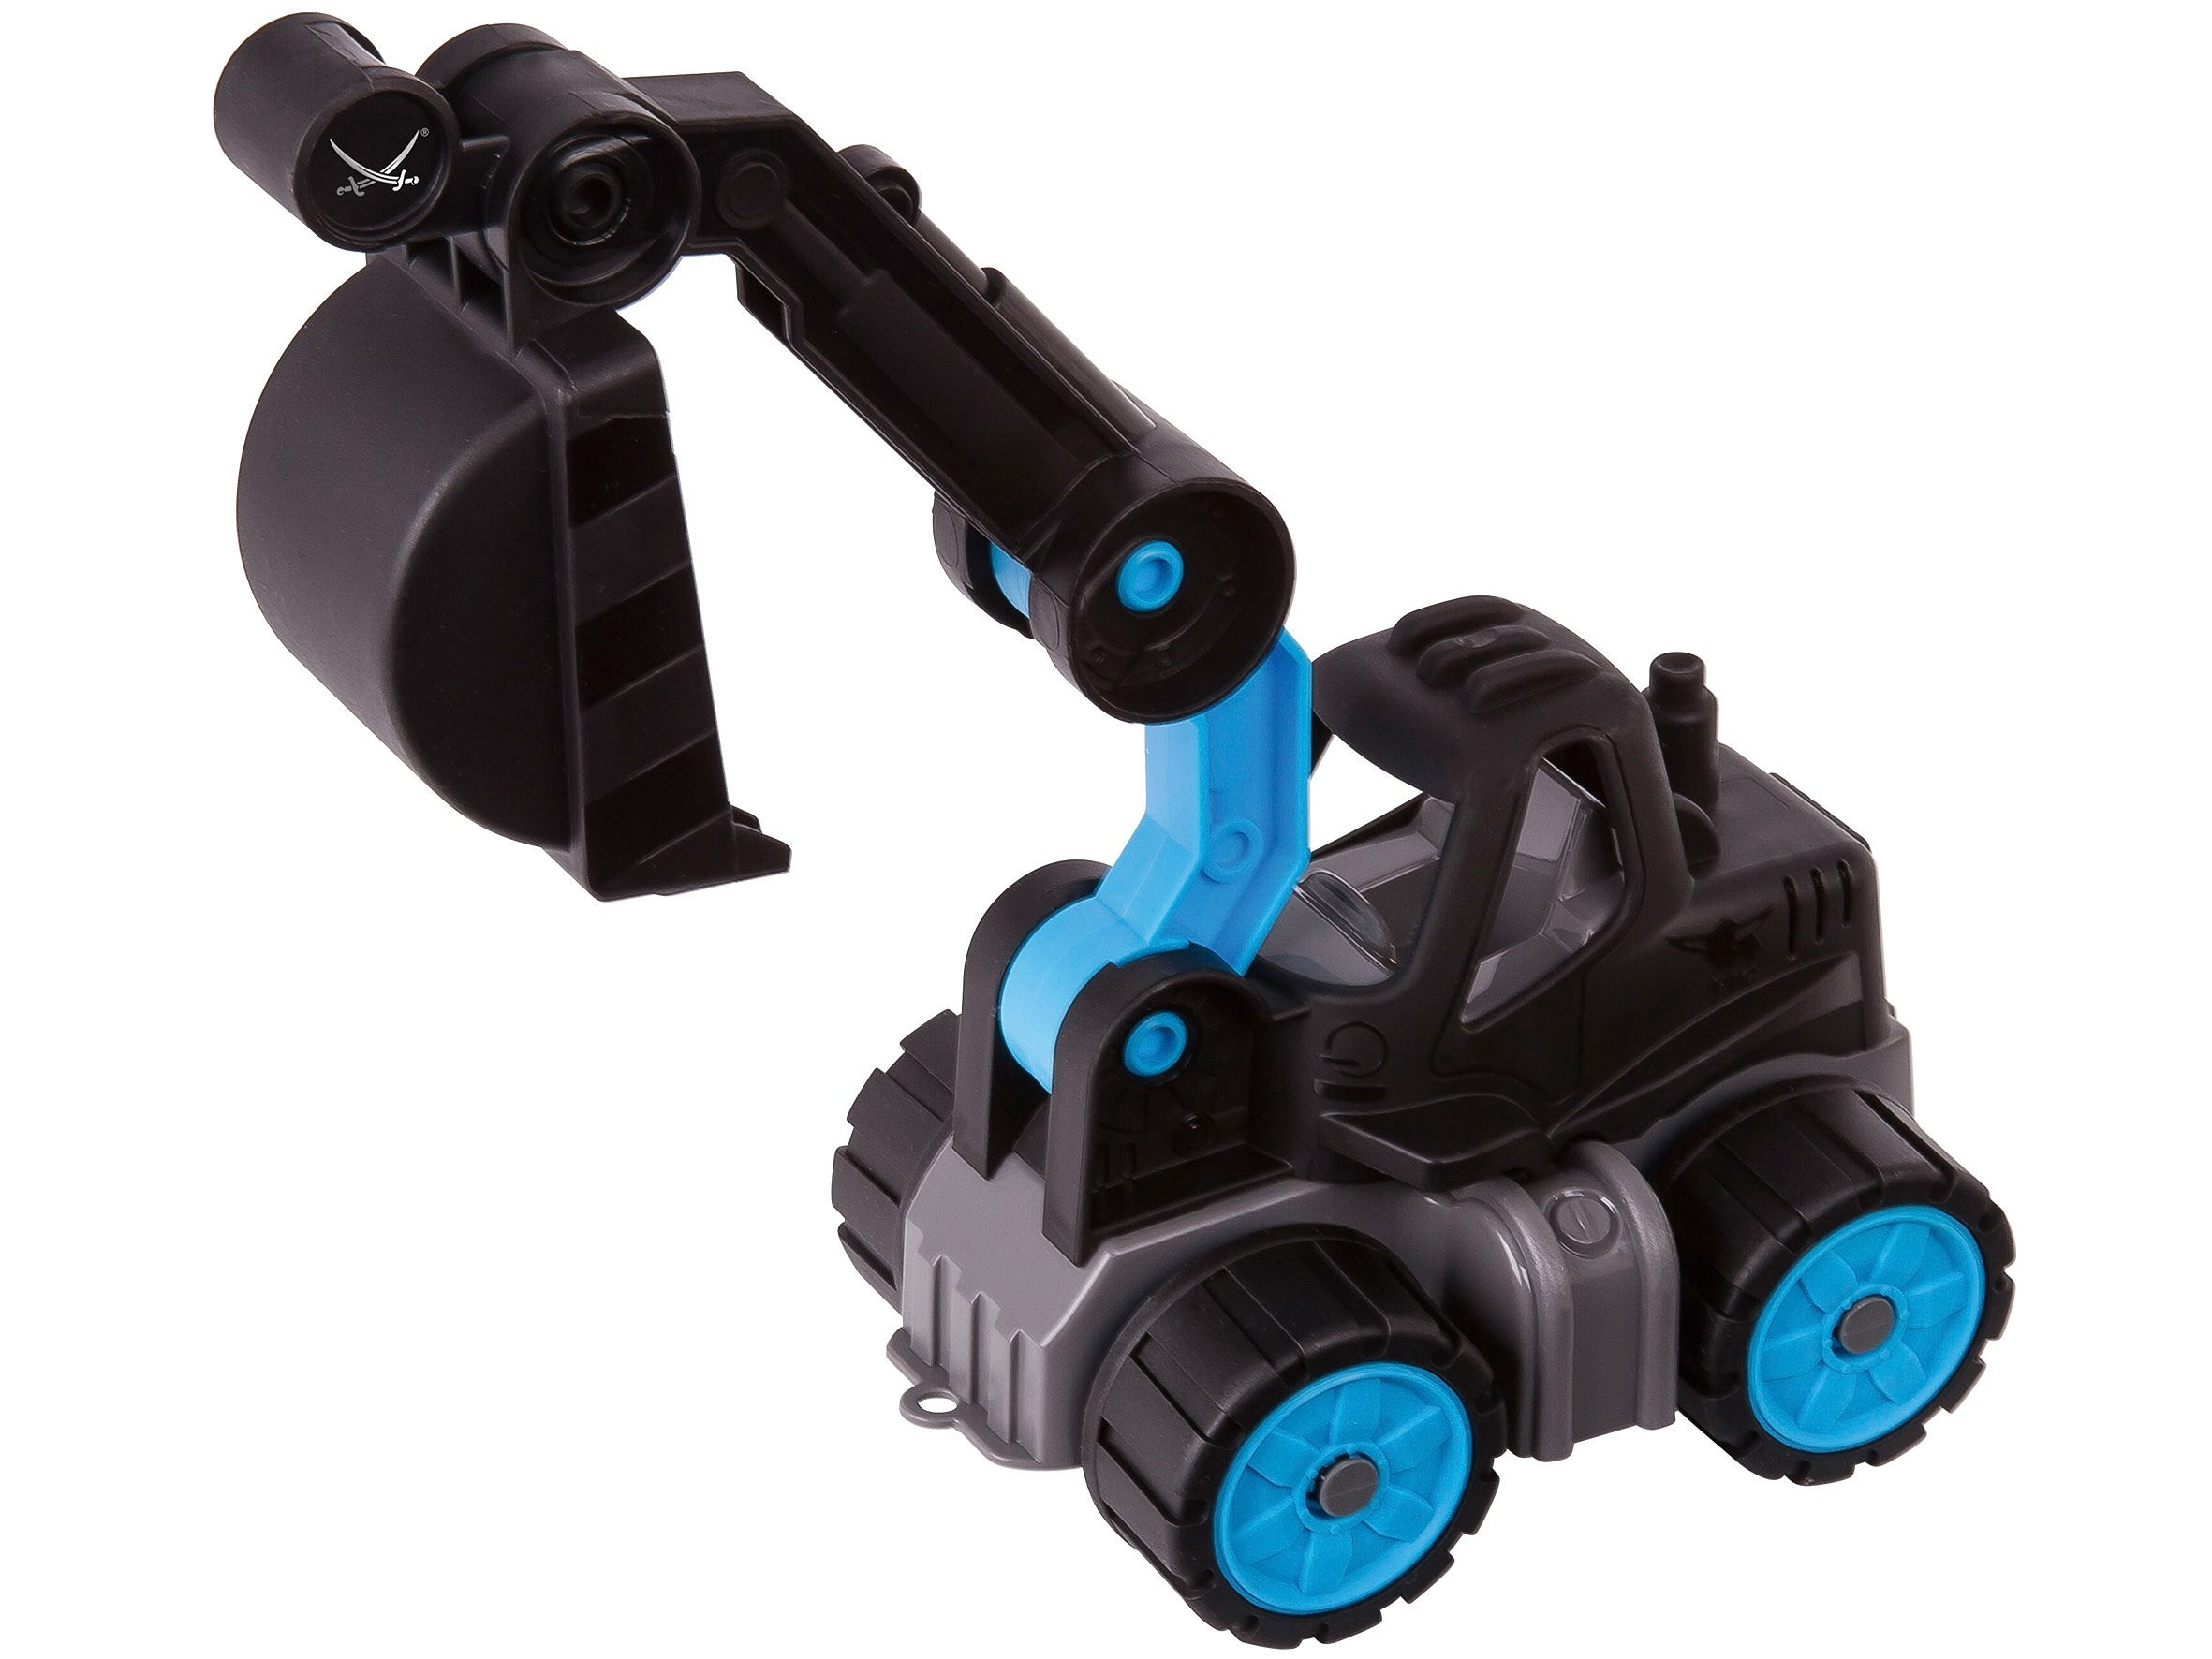 BIG Spielfahrzeug mit beweglichem Arm, »BIG Power Worker Mini Bagger Sansibar«